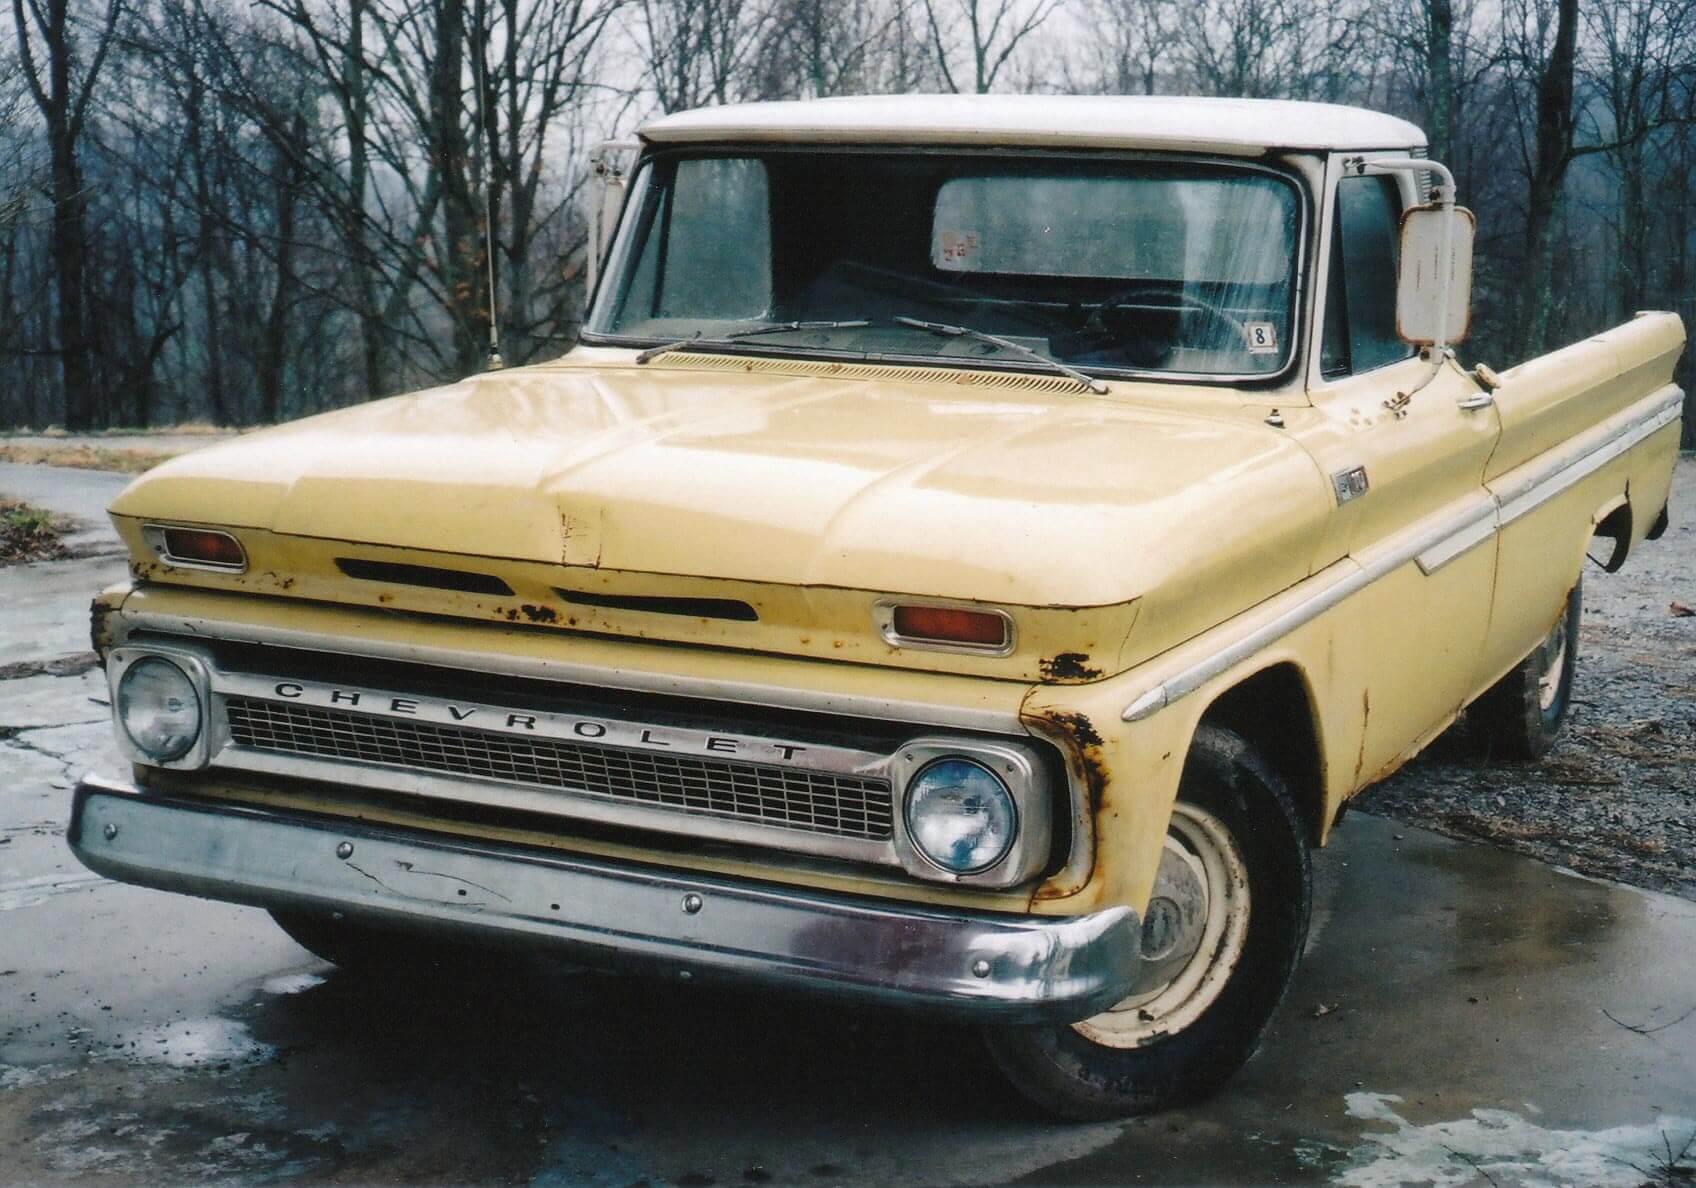 1965 Chevy C10 Robert F LMC Truck Life